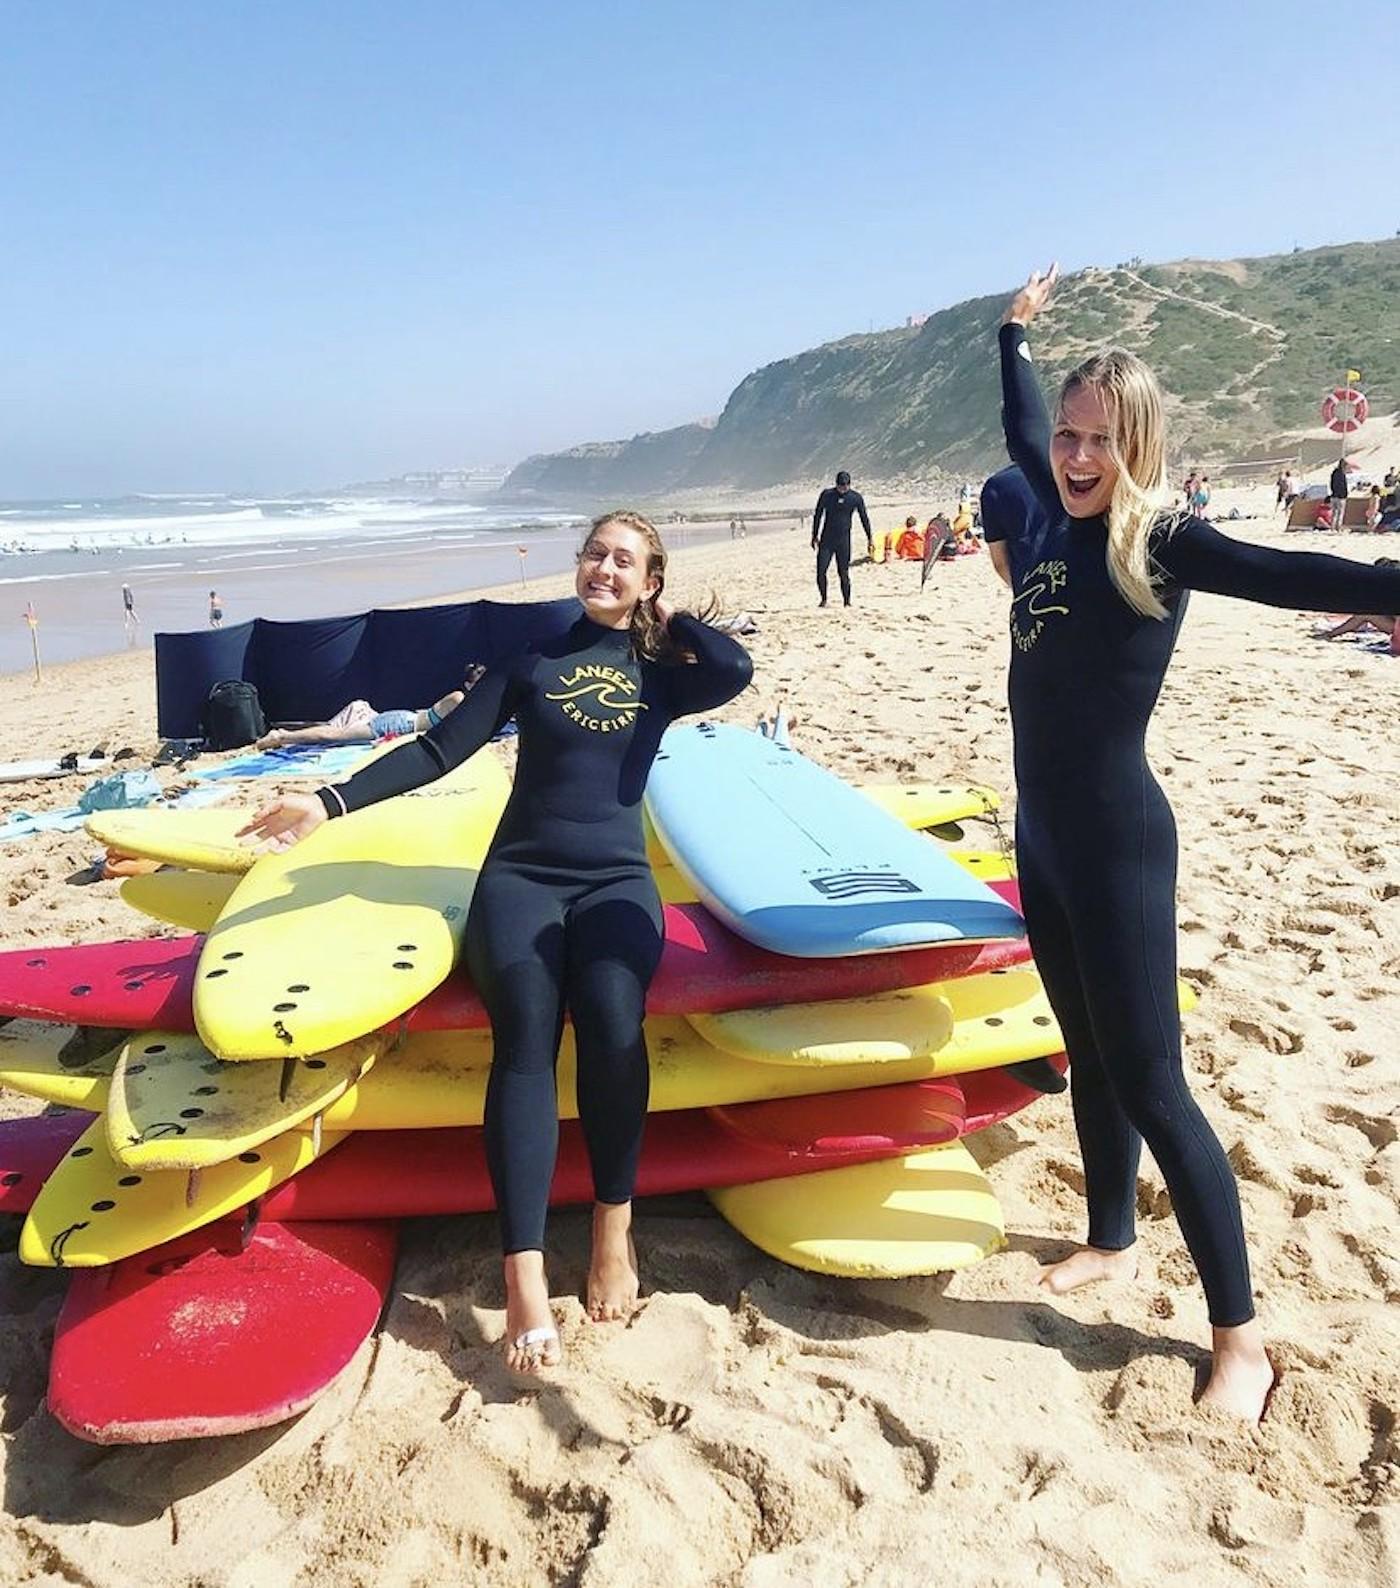 Leren surfen in Portugal